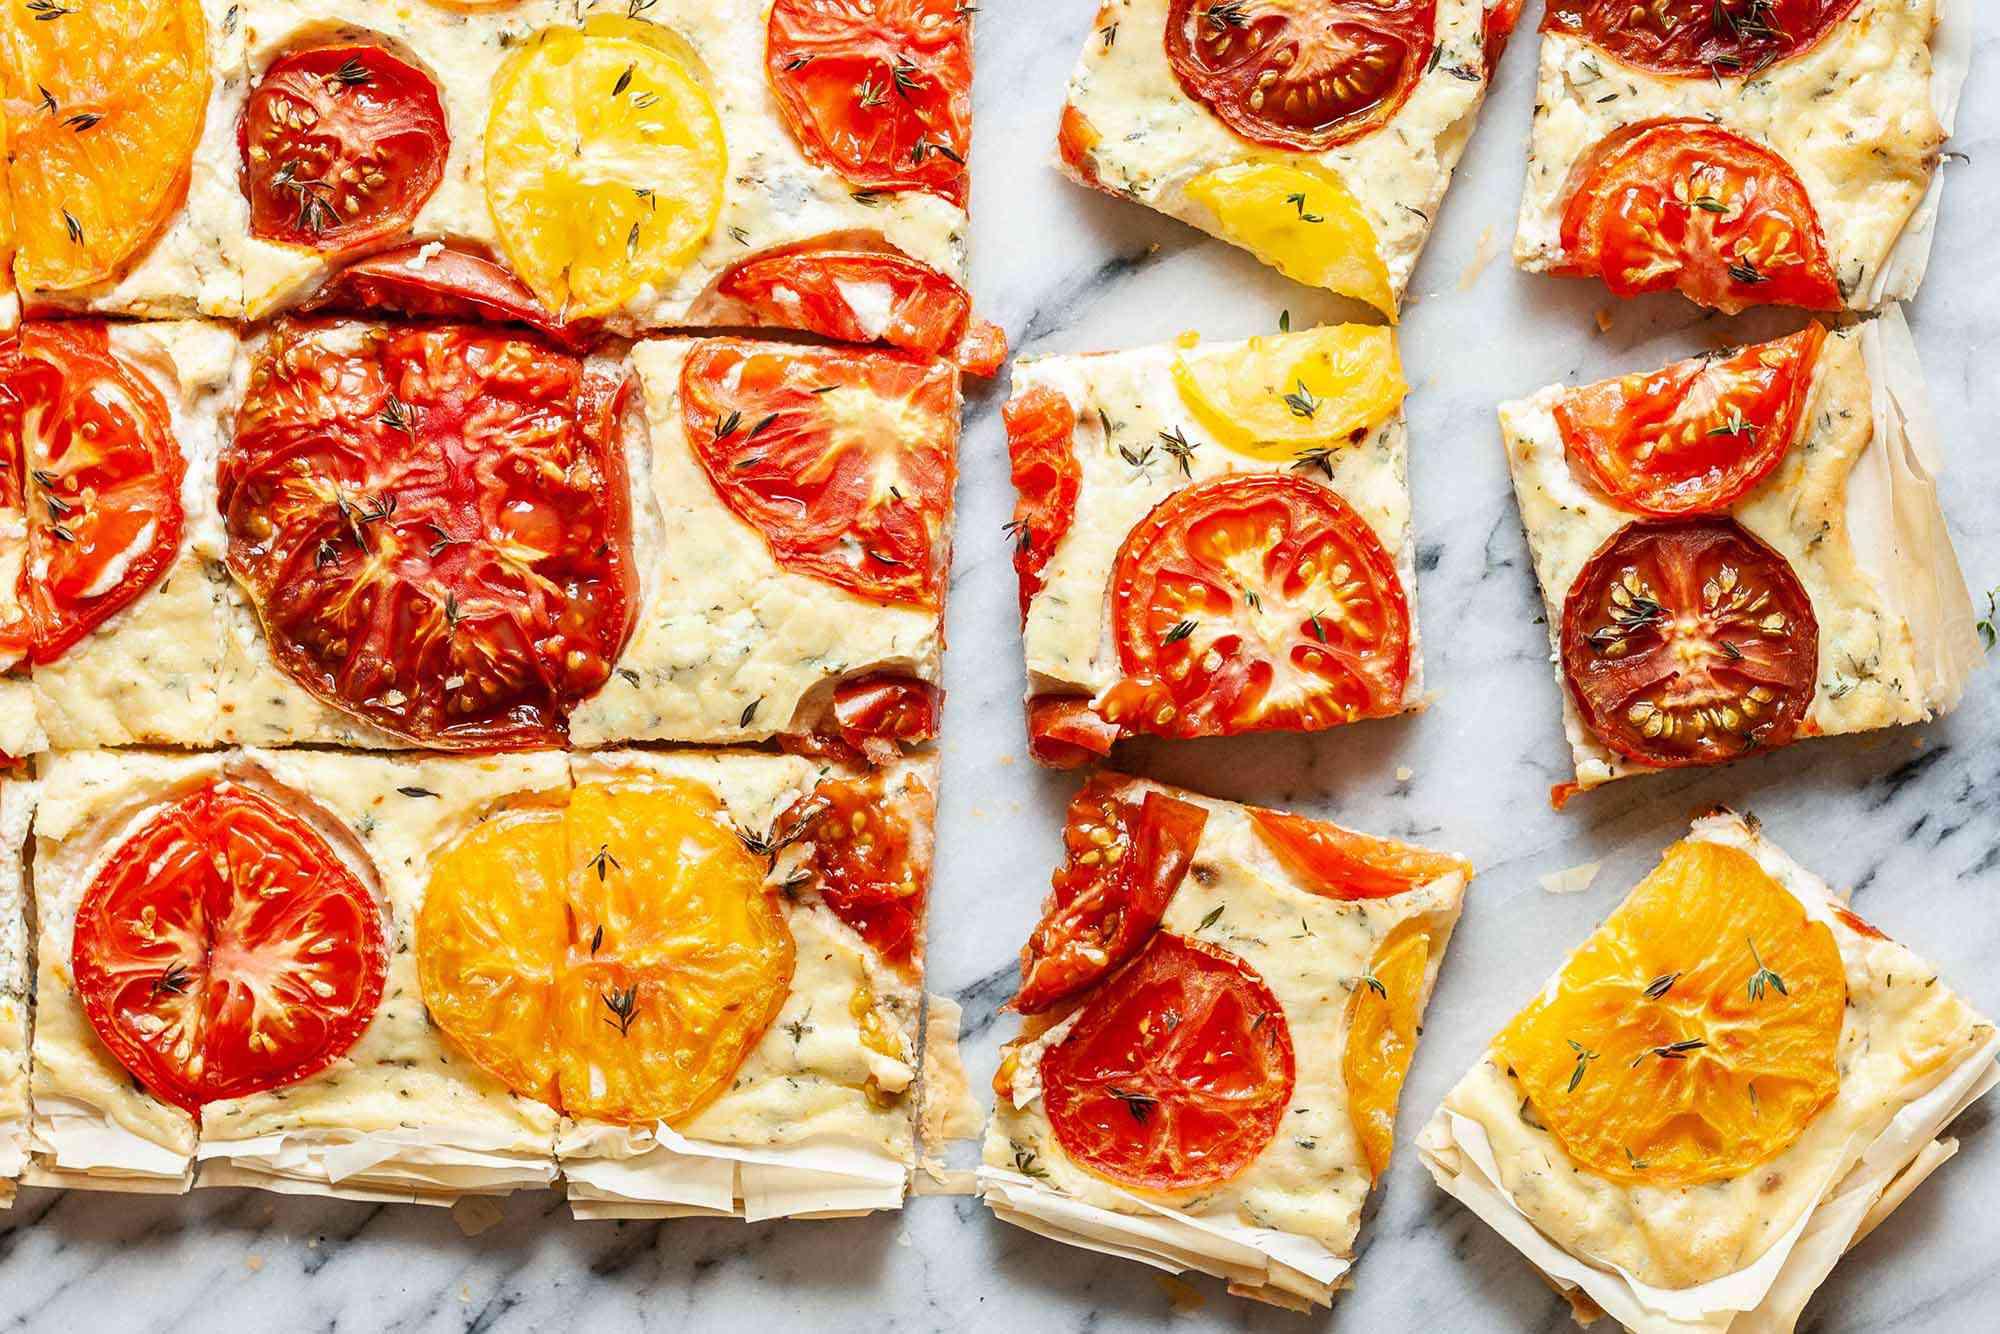 Tomatoe Tart Recipe bake and slice the tart